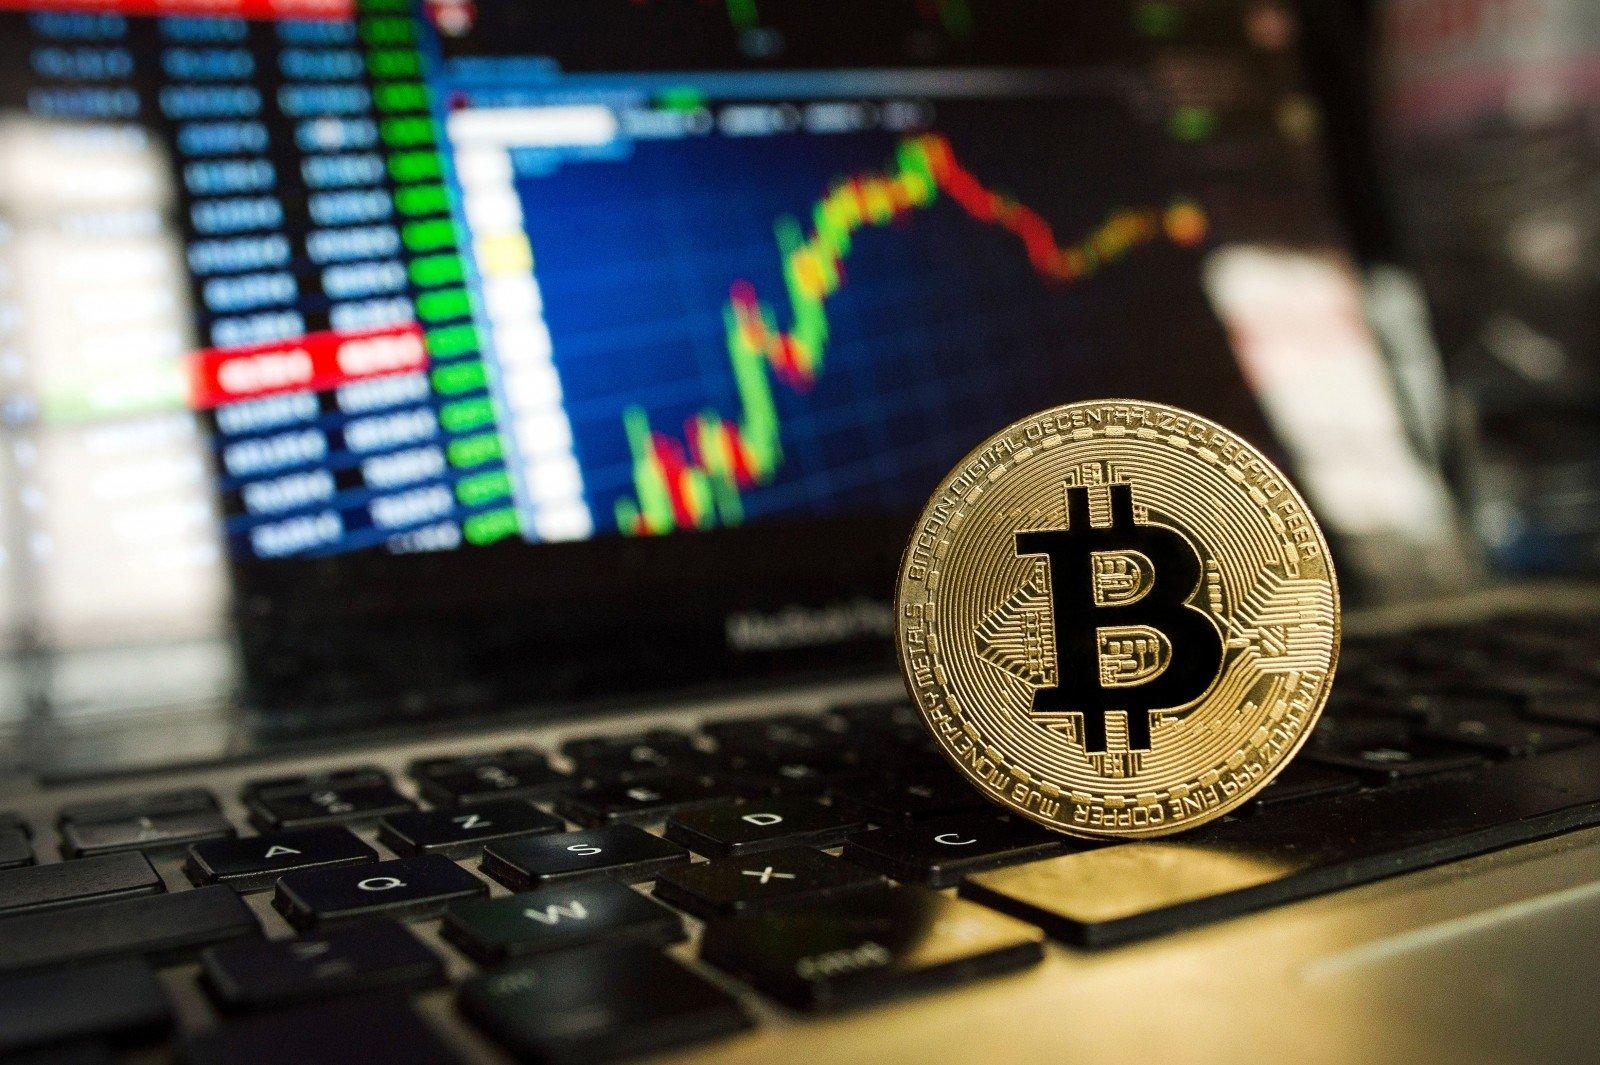 bitkoinų prognozė